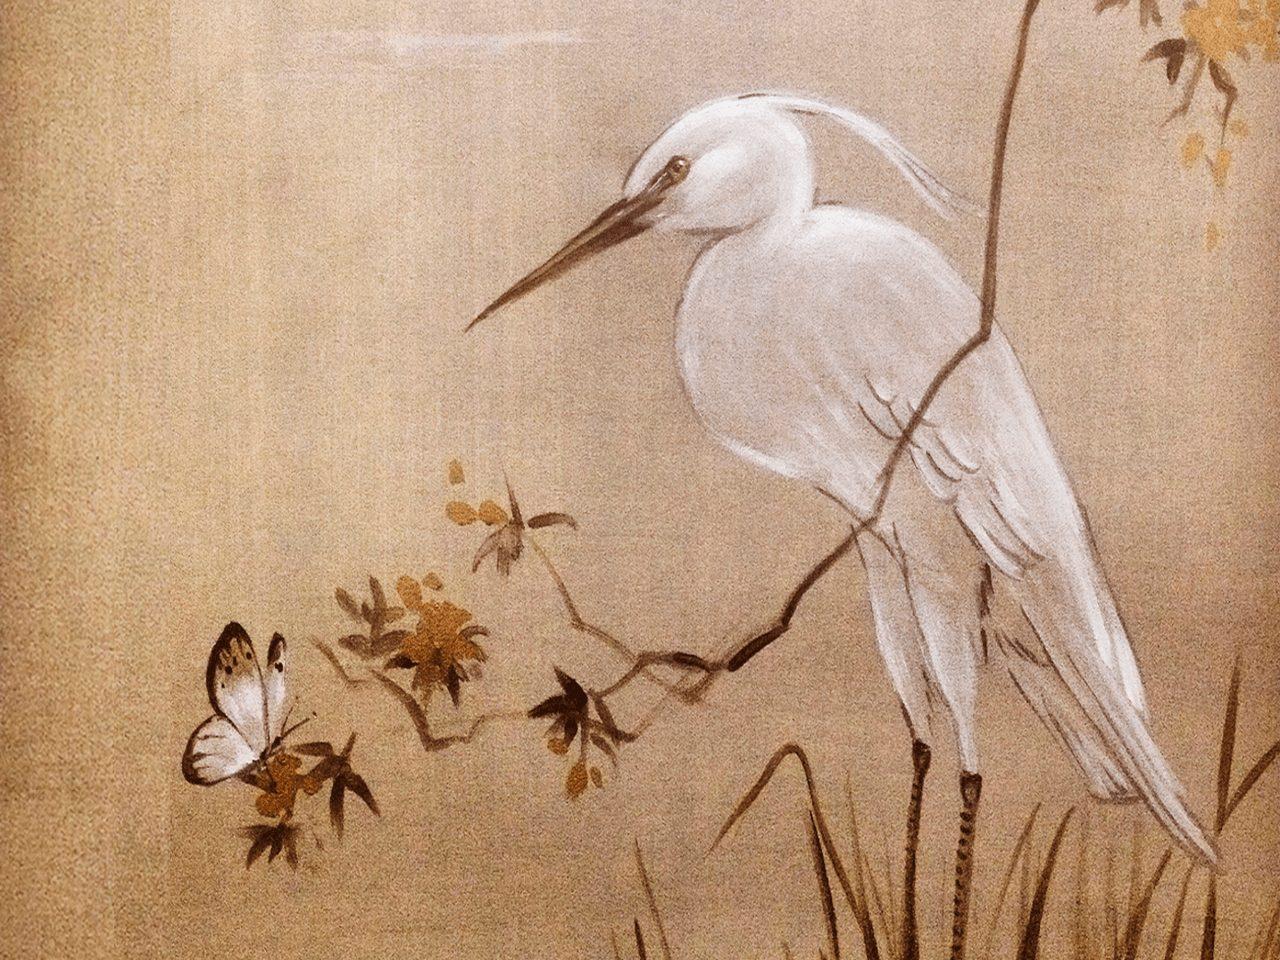 Telas-pintadas-a-mano-chinoiserie-Carol-Moreno-acrilico-wall-art-muralista-pintora-b